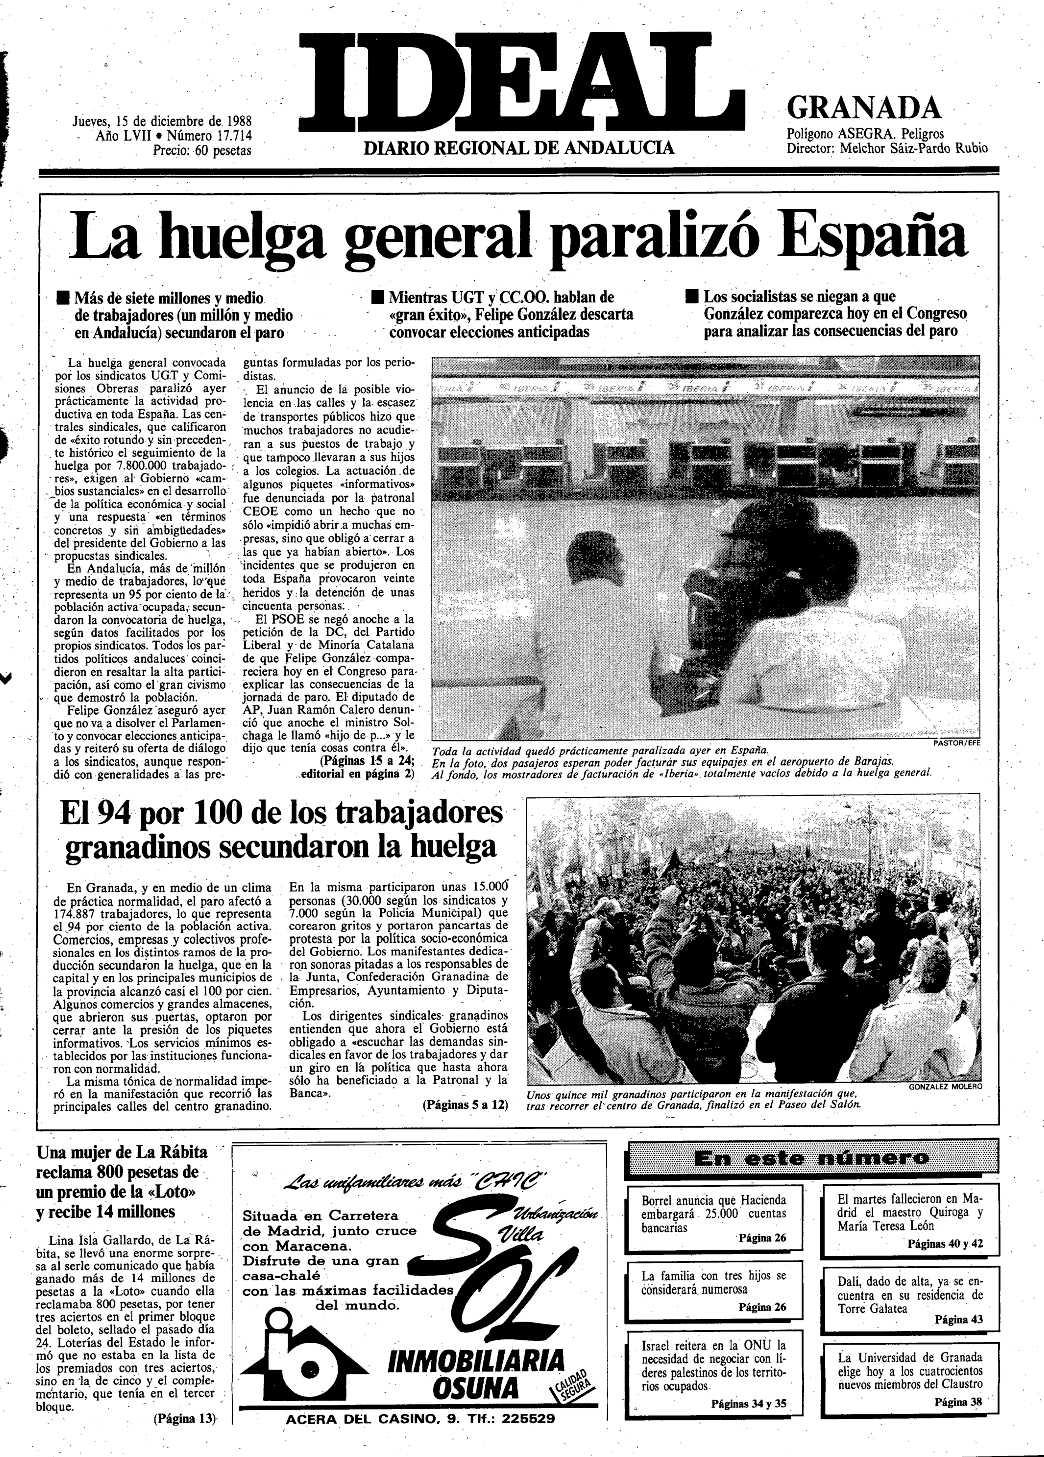 14 de diciembre de 1992: